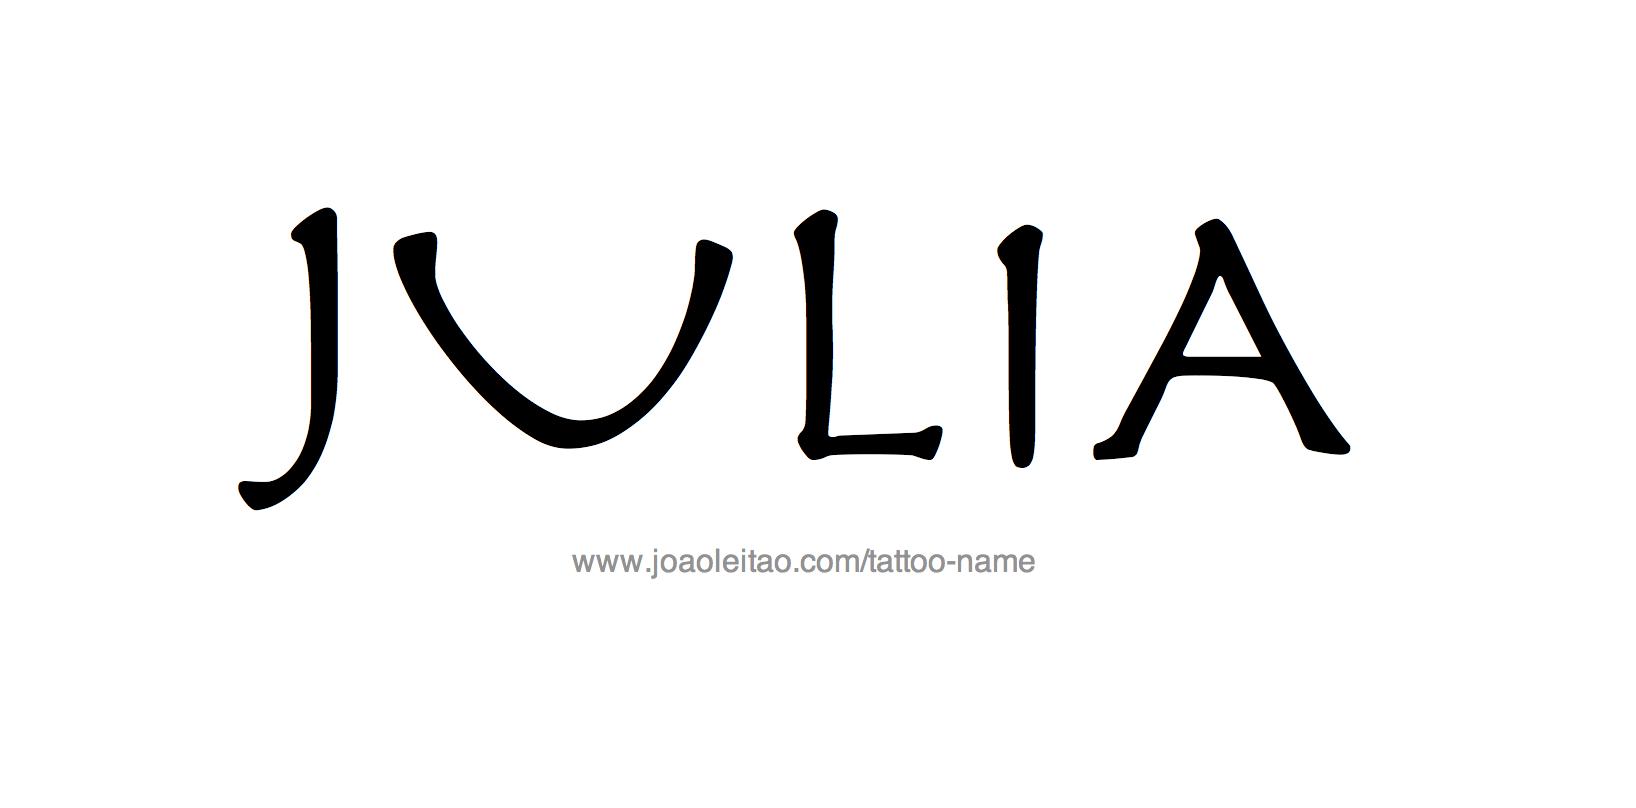 Julia Name Tattoo Designs